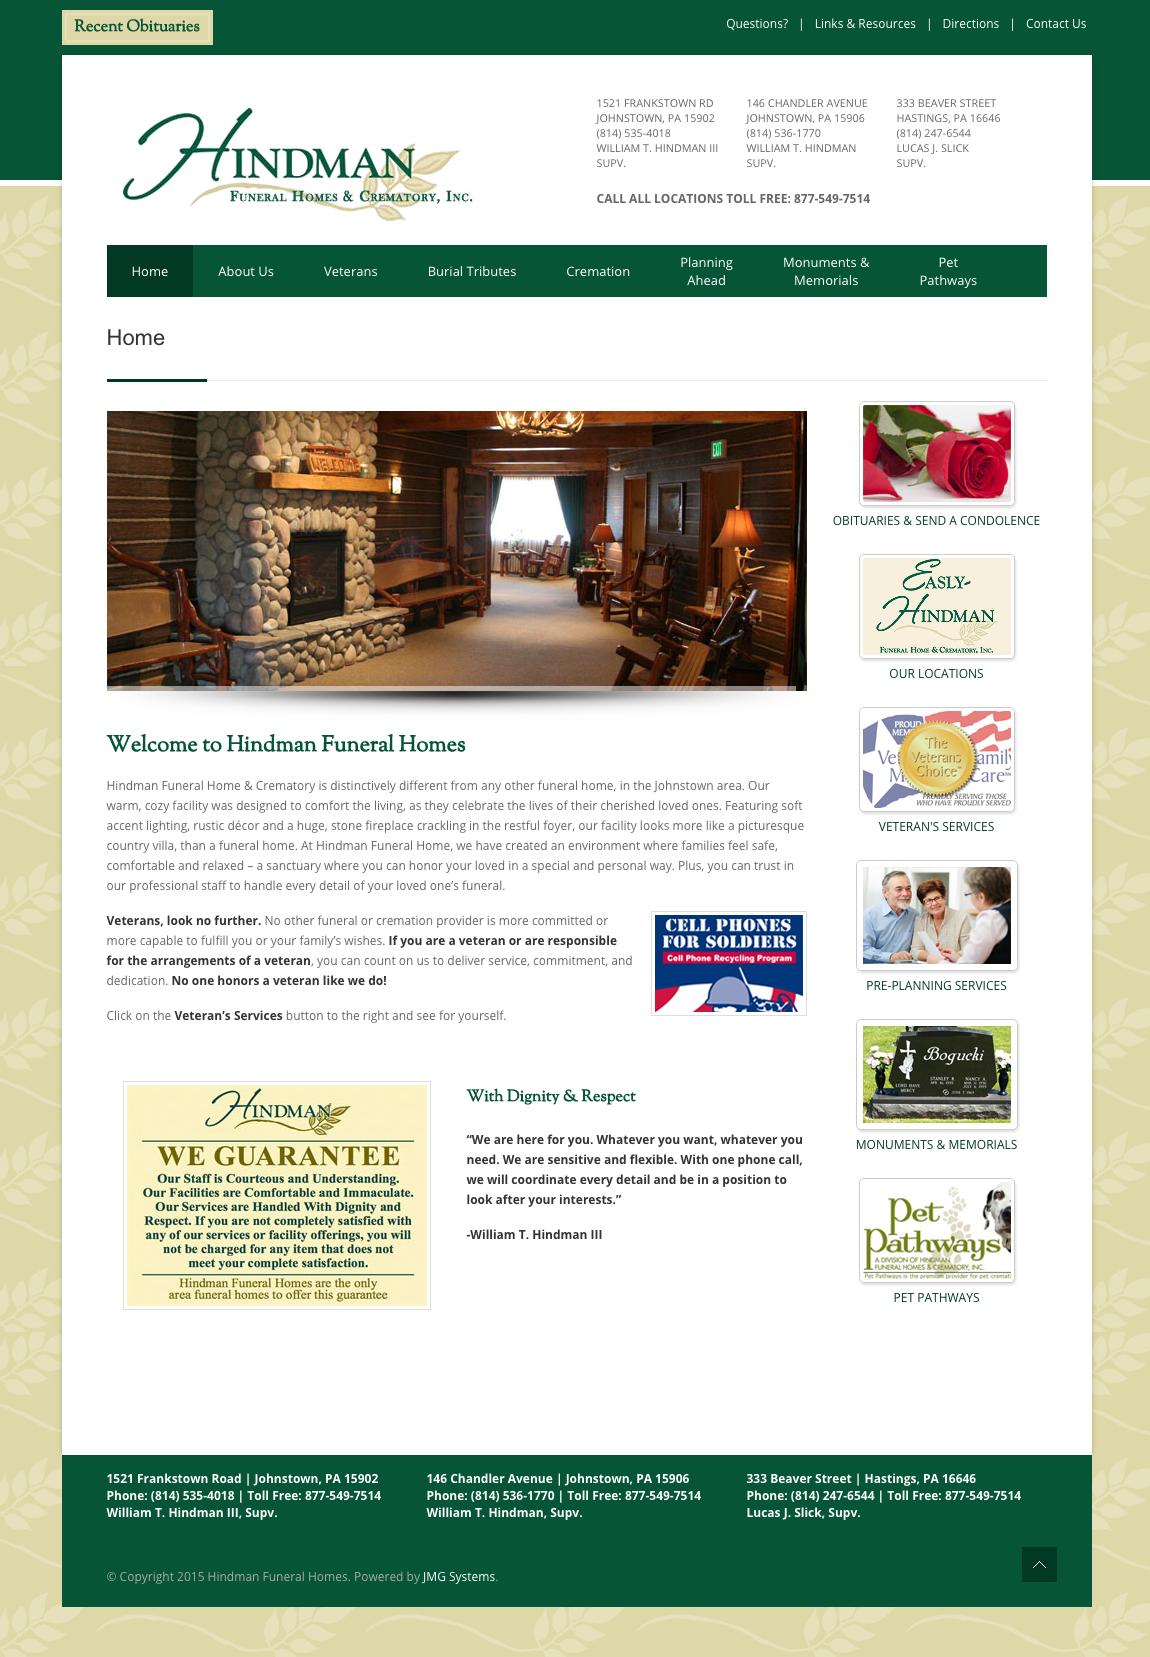 Web-Copywriting-Hindman-Funerals-WritePunch.jpg